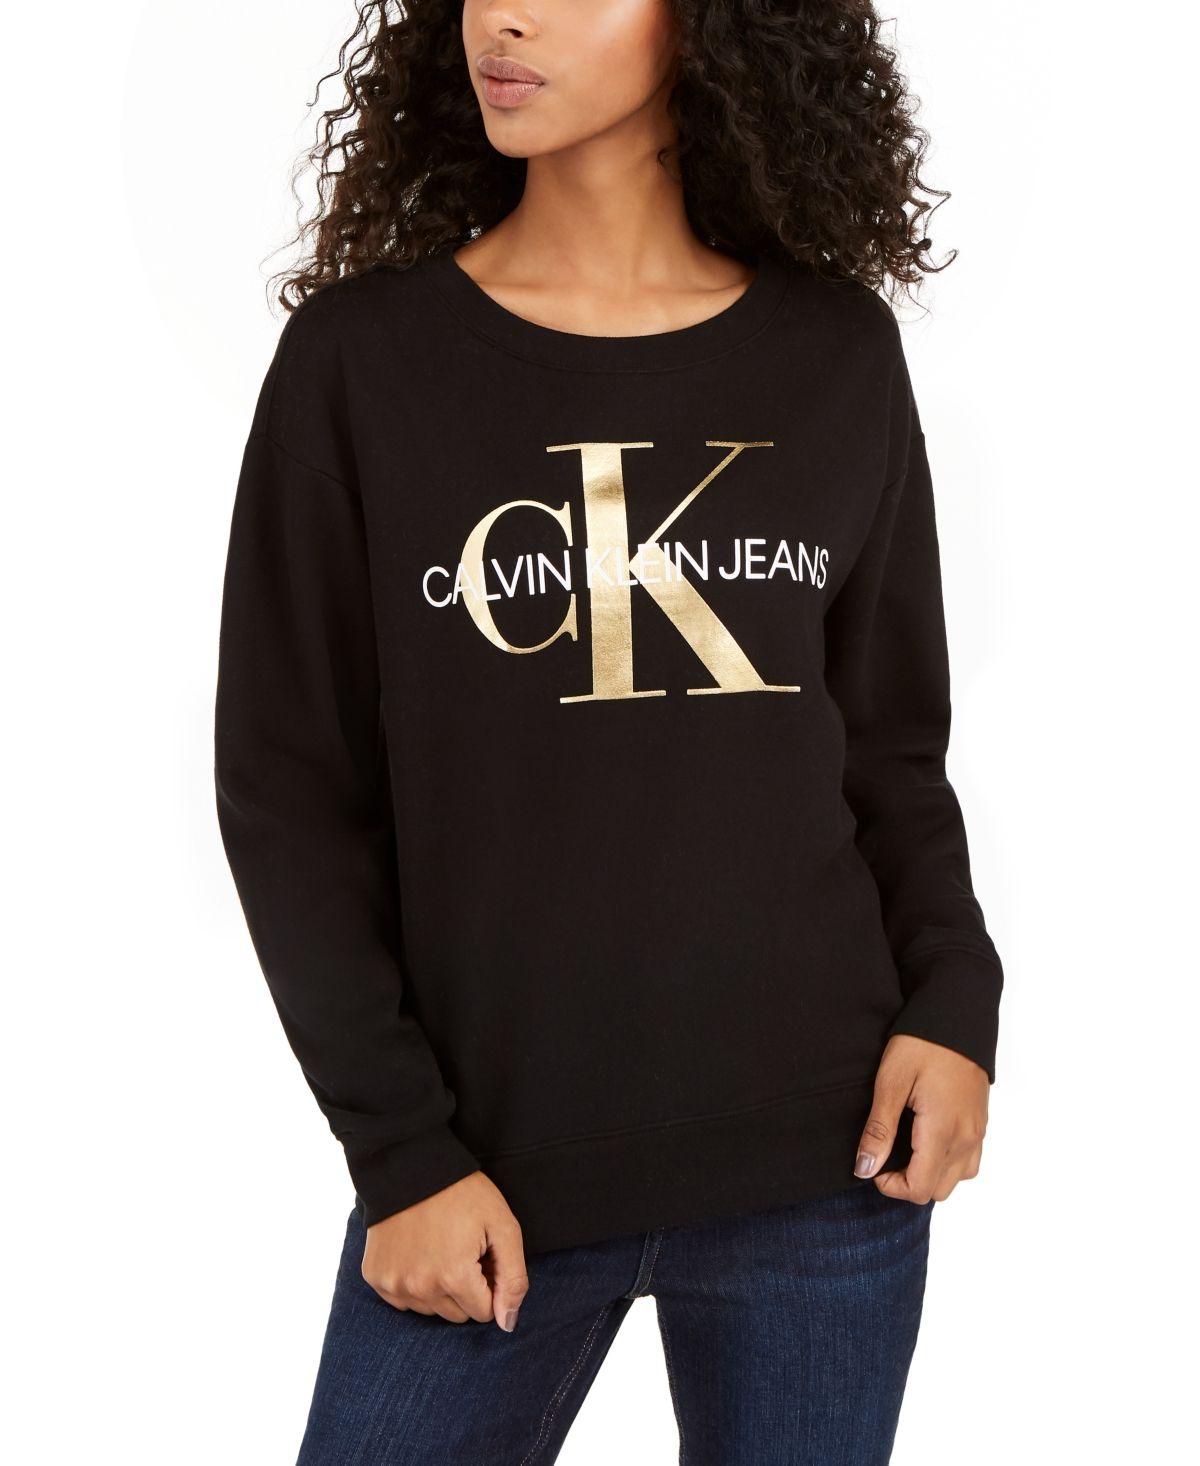 Calvin Klein Jeans Logo Print Sweatshirt Black In 2020 Sweatshirts Printed Sweatshirts Calvin Klein Jeans